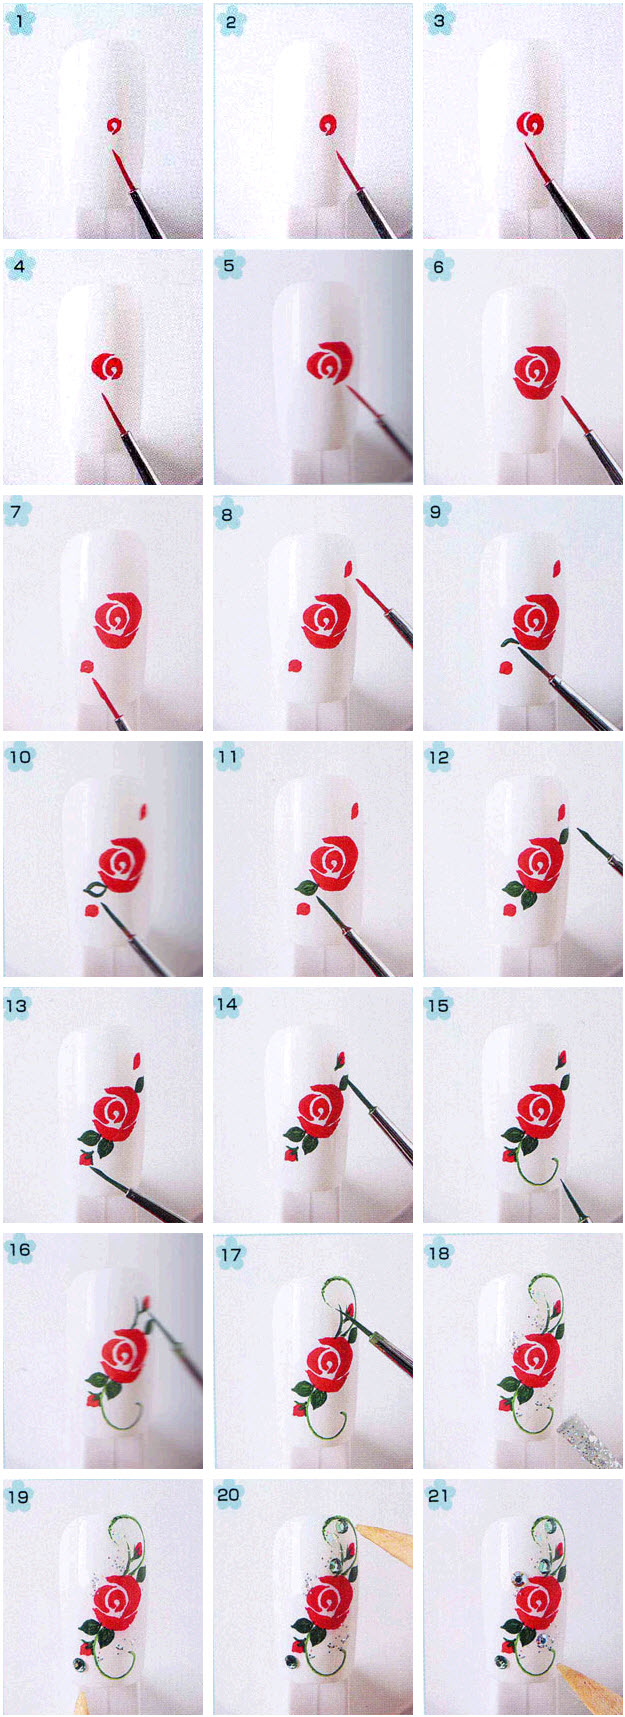 Схемы рисунков на ногтях в домашних условиях